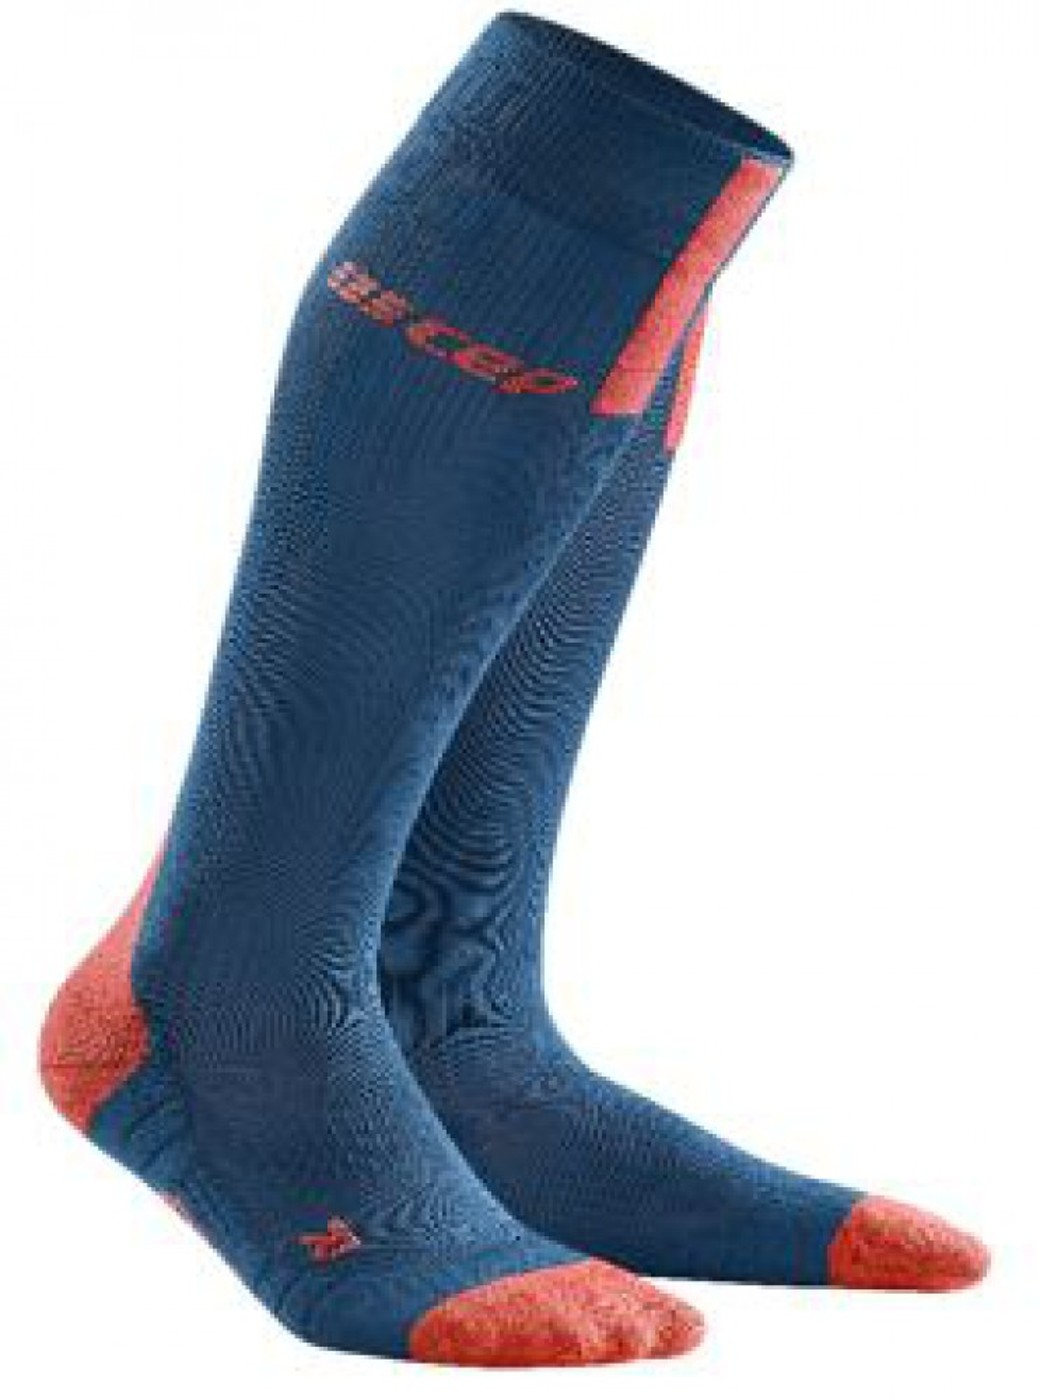 CEP knee high run socks 3.0 - Herren